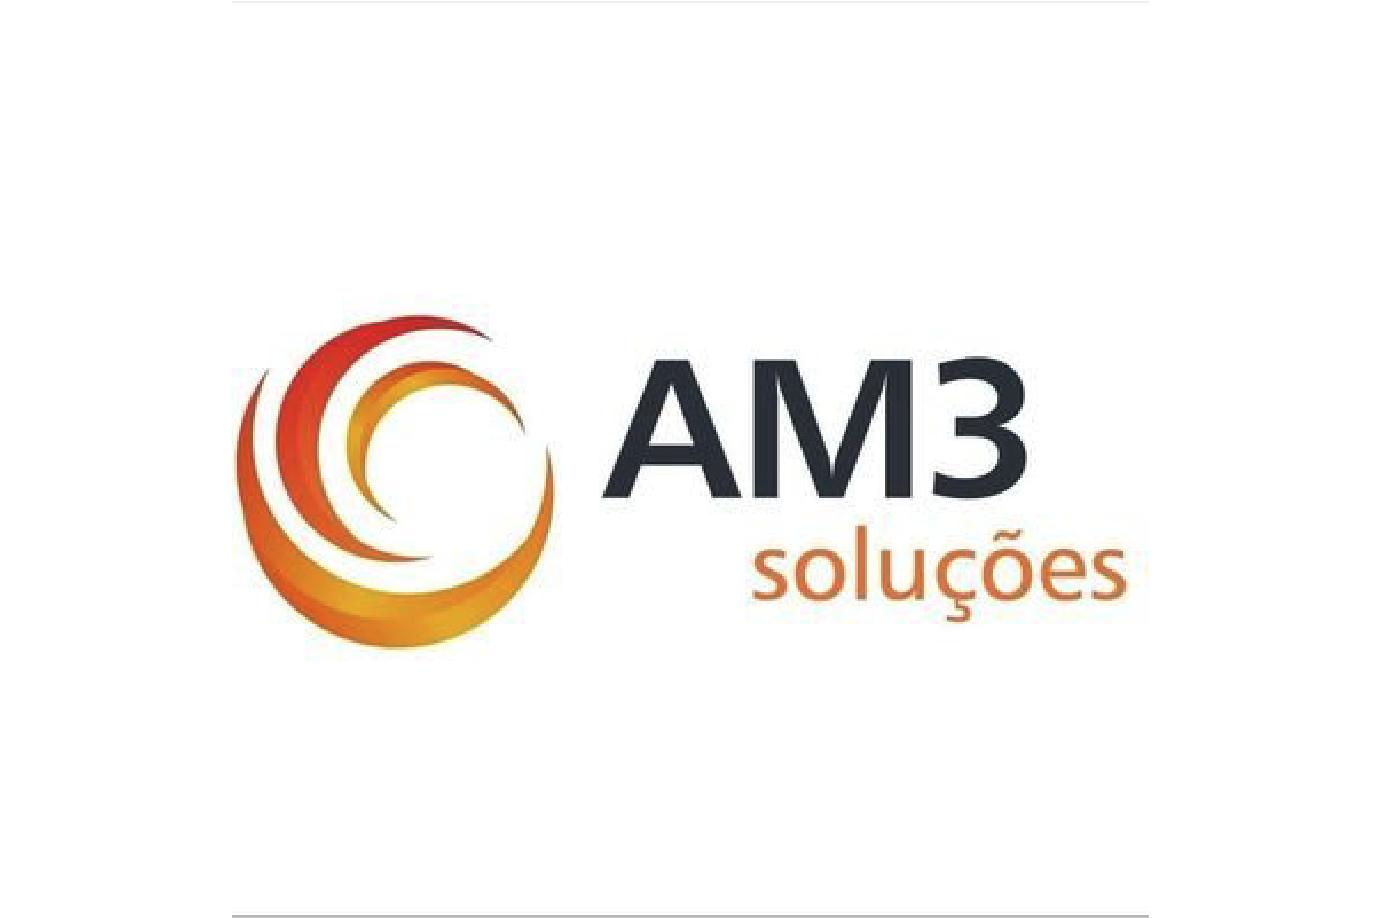 am3solucoes-81